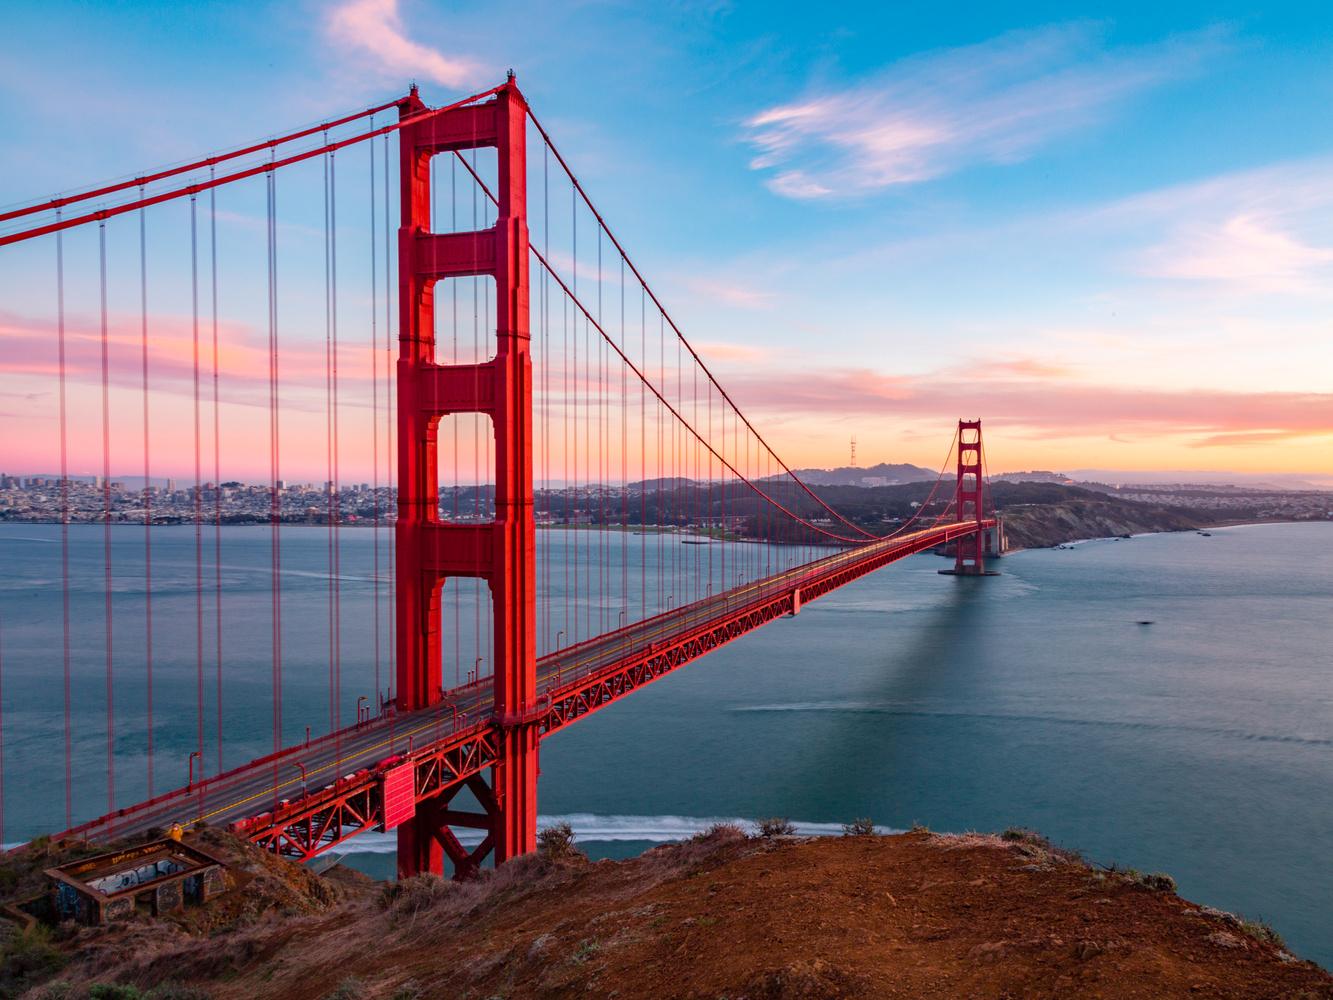 Evening at the Golden Gate Bridge by Viren Nathan